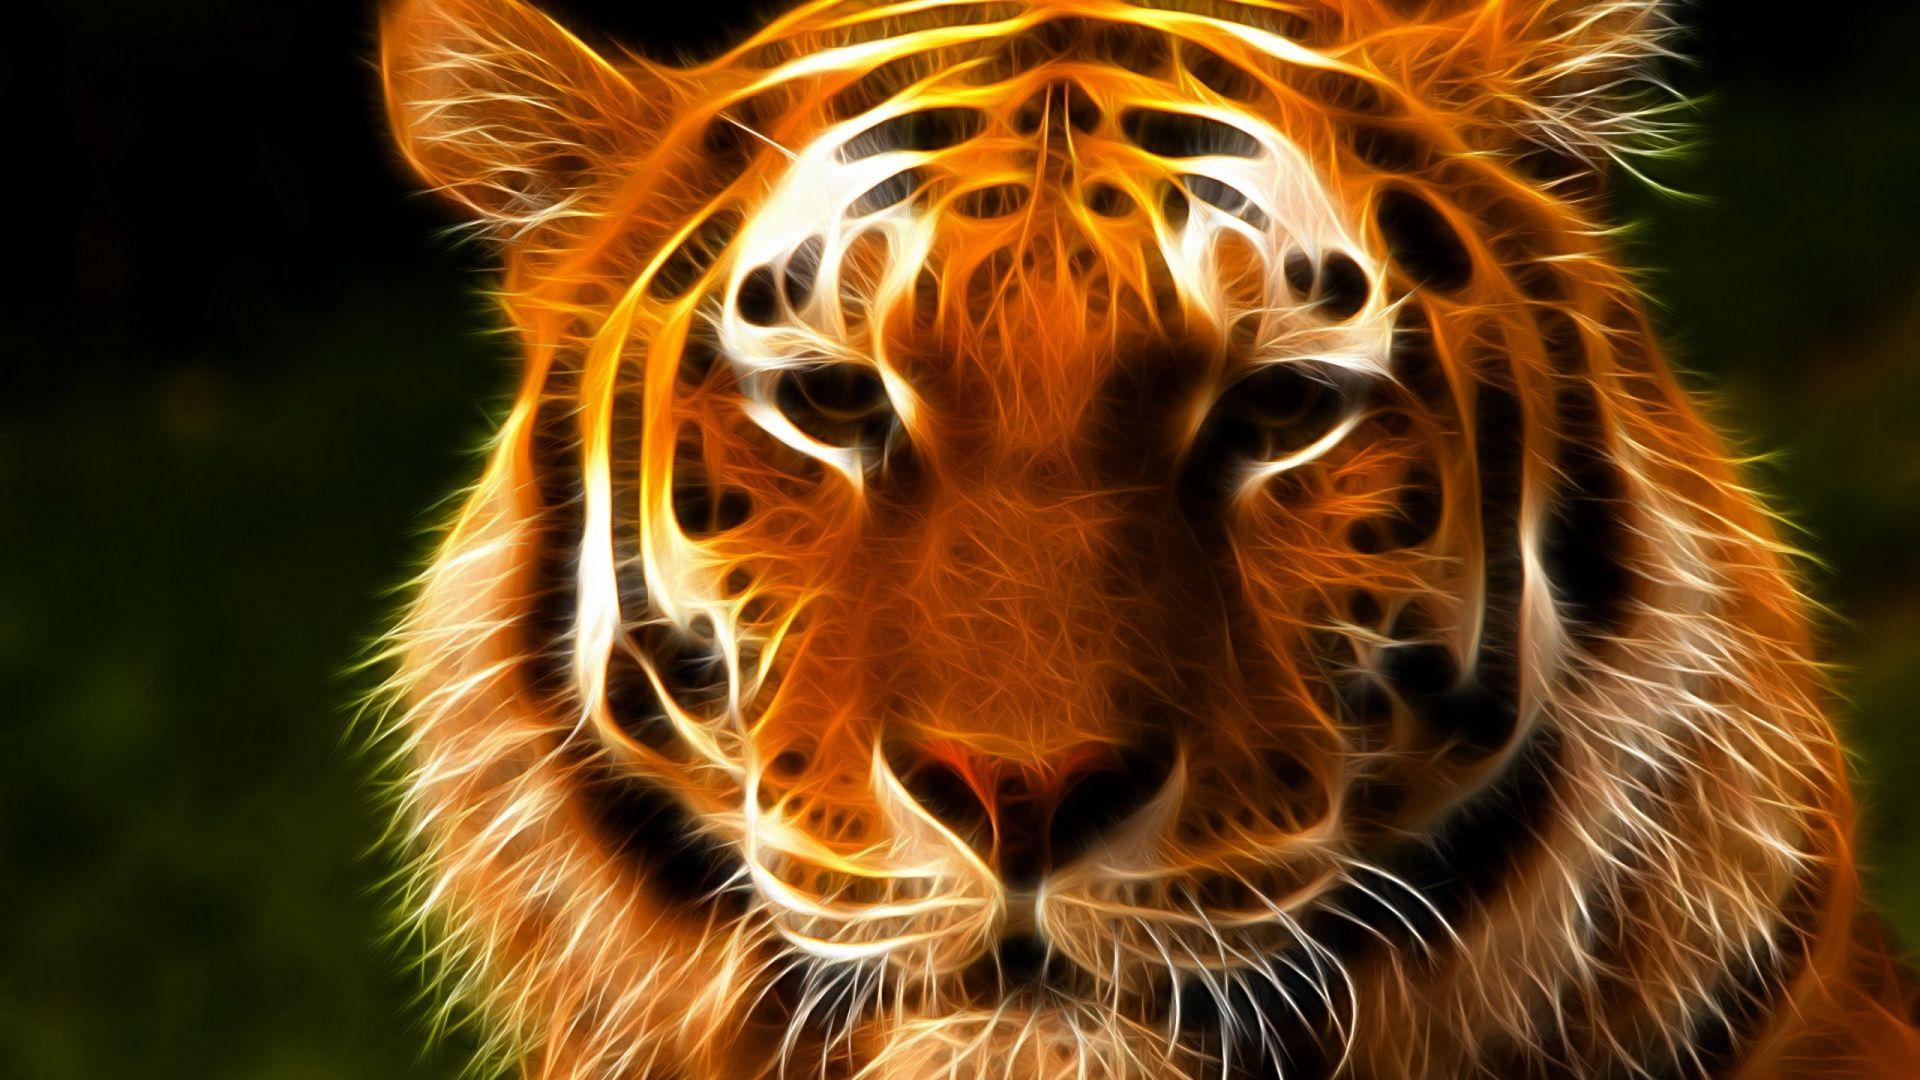 Digital art fantasy tiger face fantasy hd wallpapers pinterest digital art fantasy tiger face thecheapjerseys Image collections